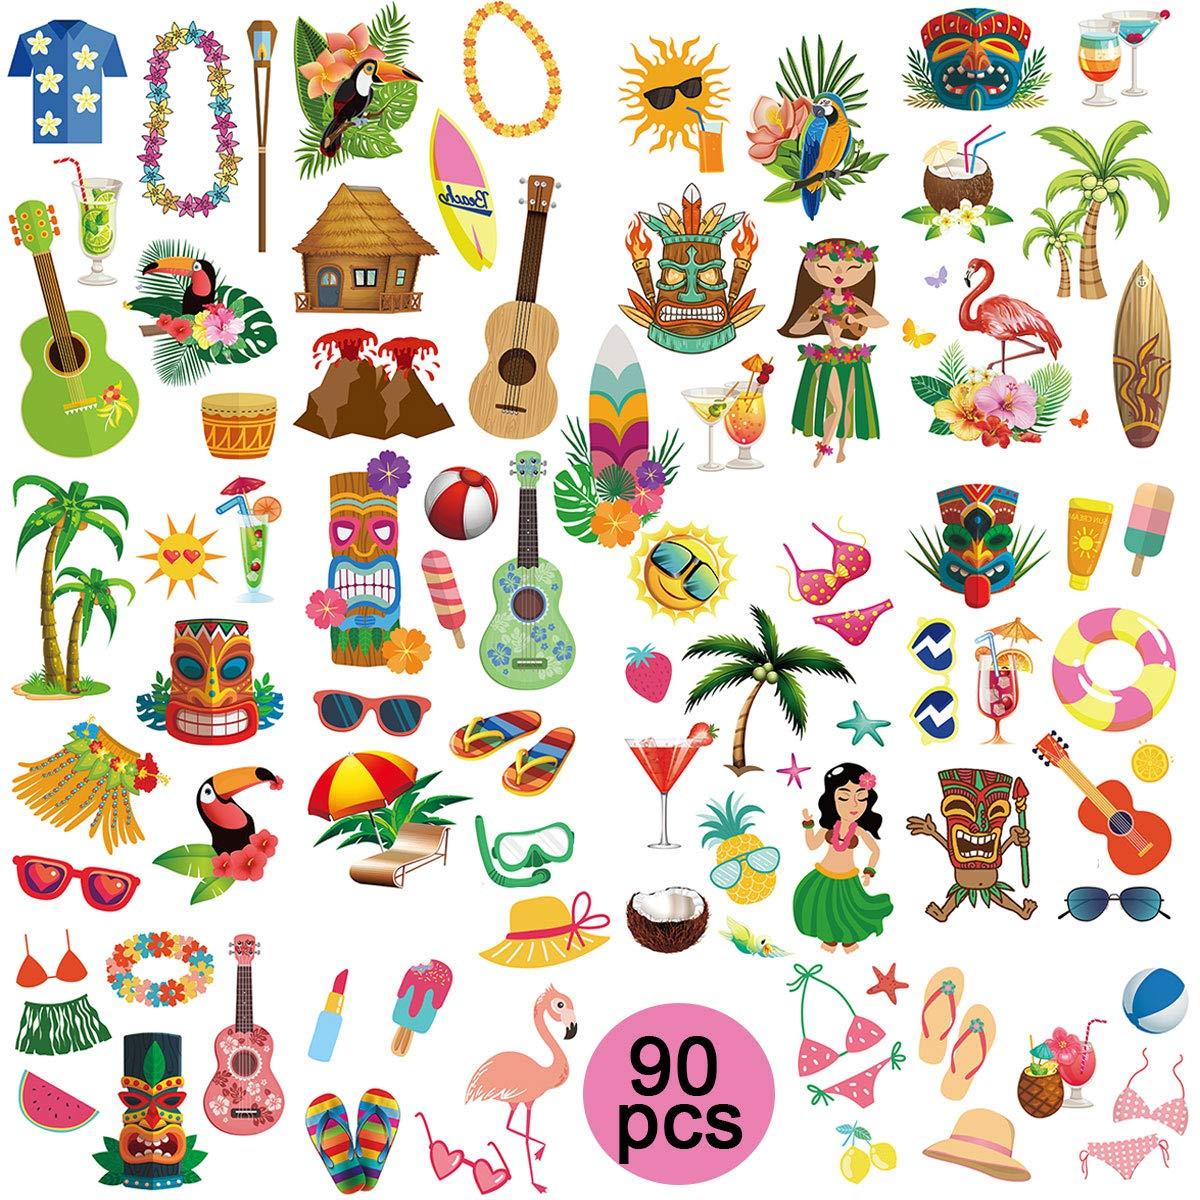 ghdonat.com Novelty & Gag Toys Toys & Games 90Pcs Luau Hawaiian ...